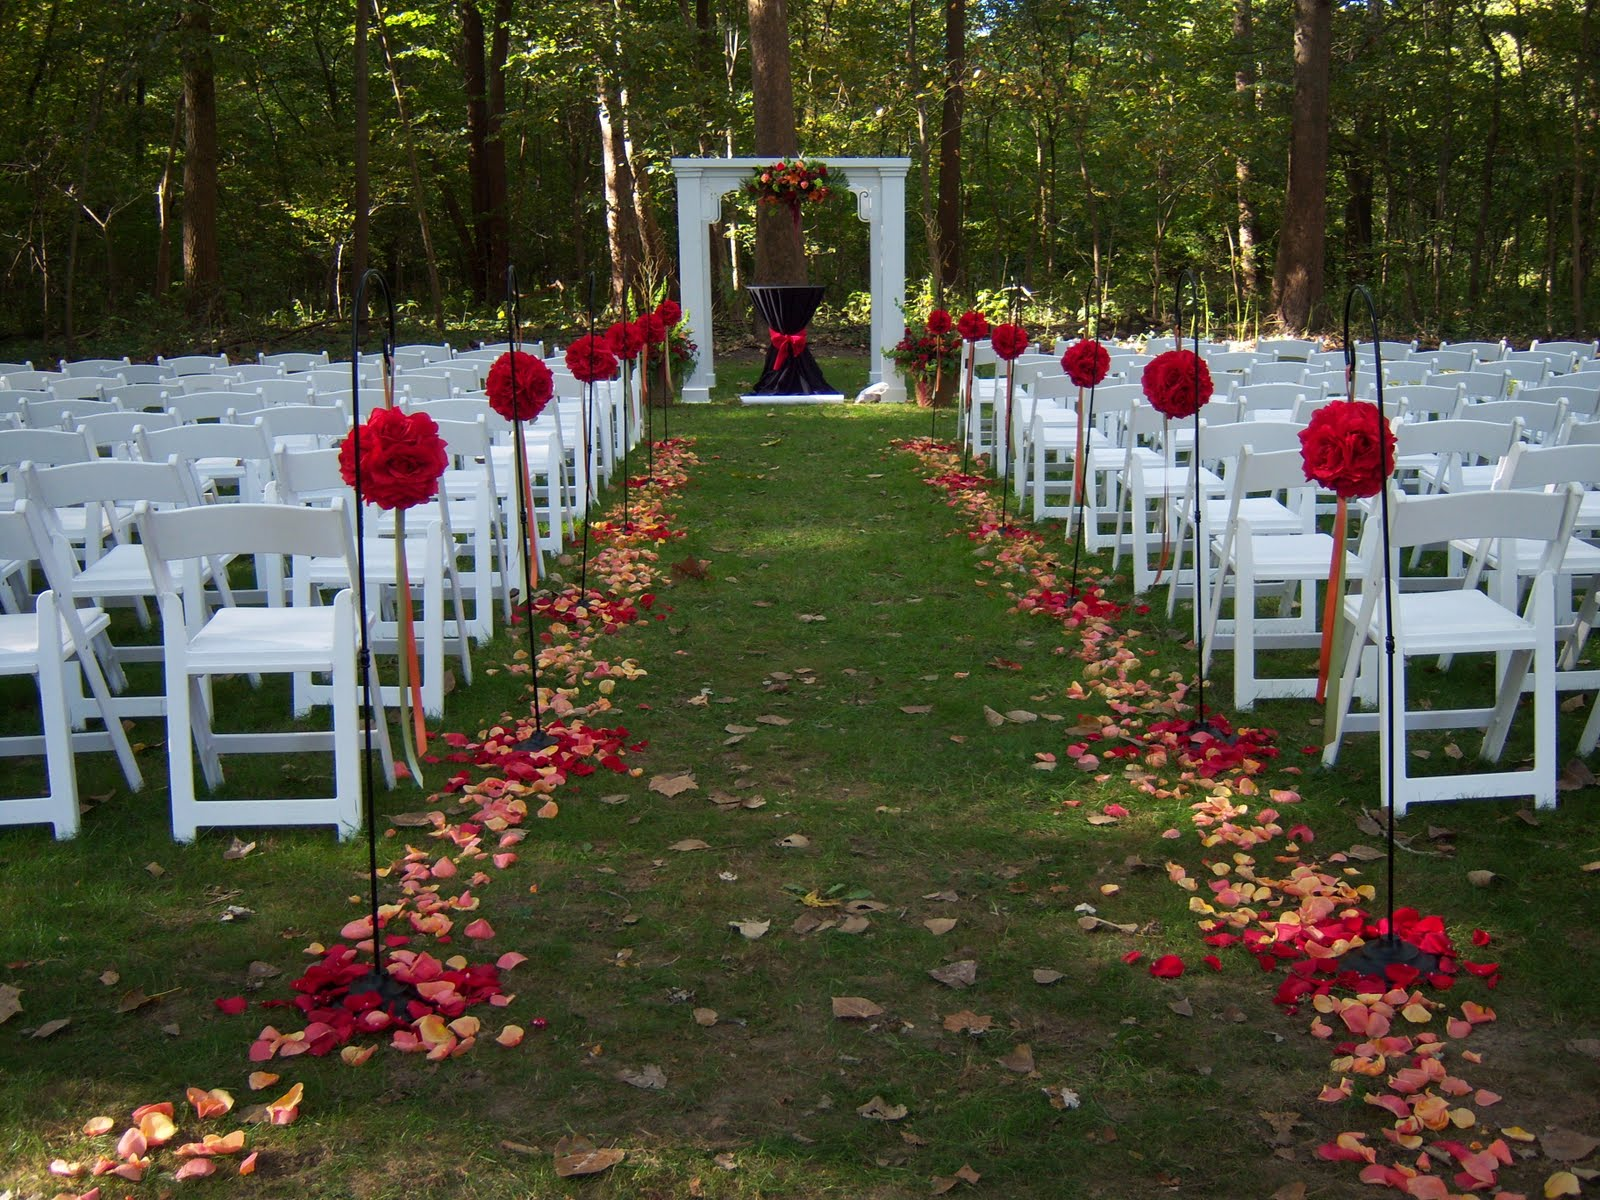 Fall Wedding Centerpieces On A Budget: Weddingspies: Fall Outdoor Wedding